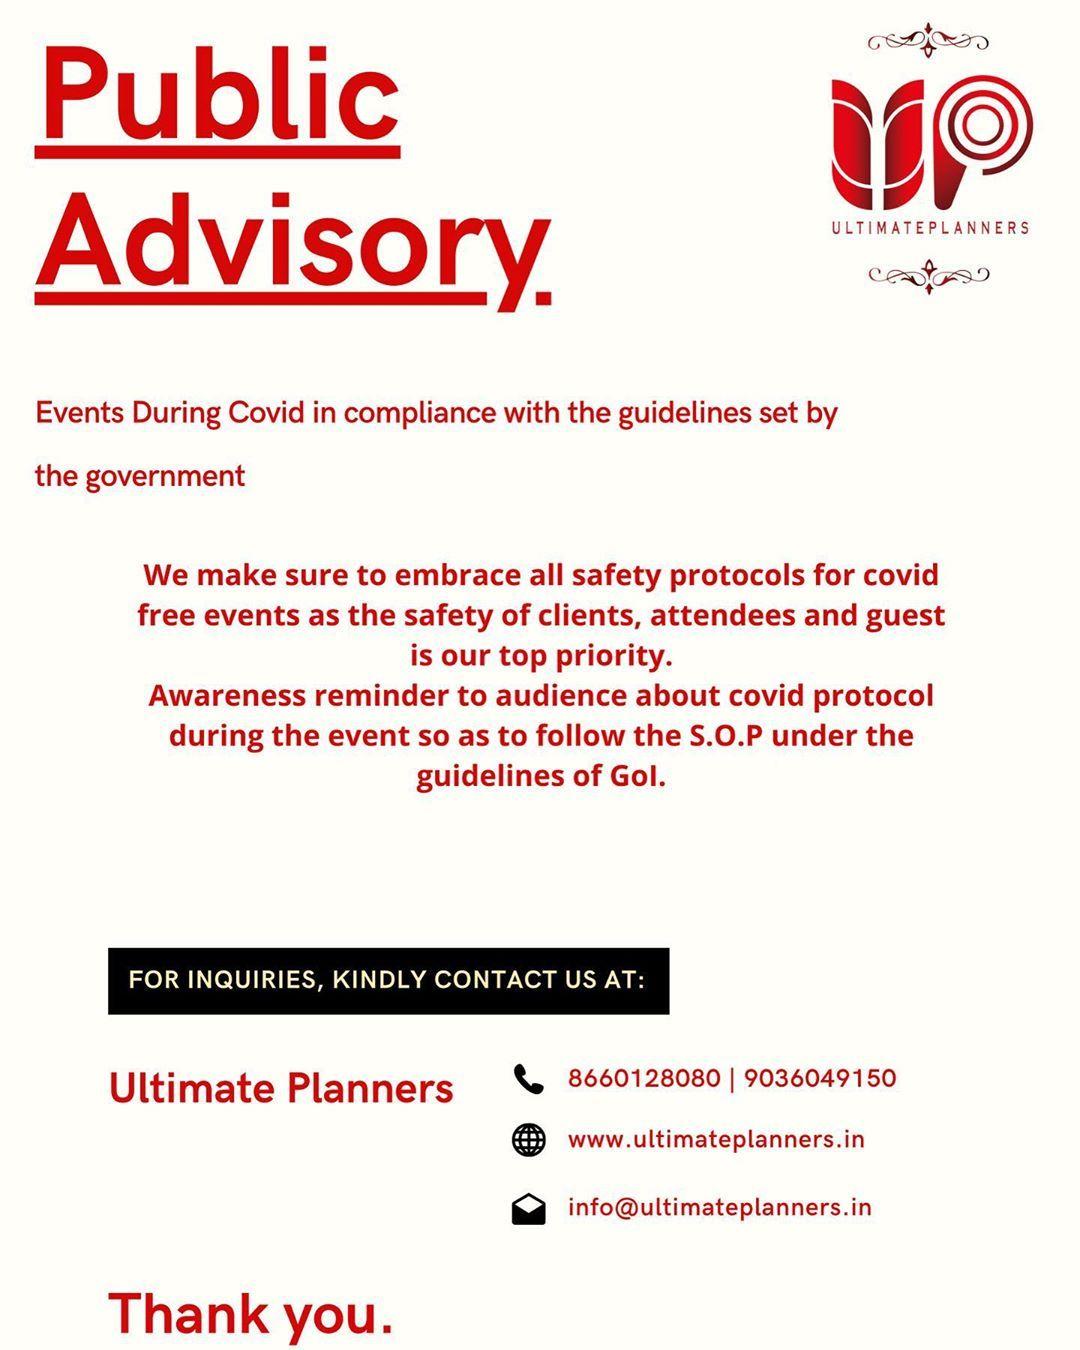 Public Advisory  #eventplanner #eventplanners #covidplanning #eventsinbangalore #bangalore #india #ultimateplanners #wedding #weddings #indianwedding #indianweddings #corporate #corporateevents #btl #btlactivation